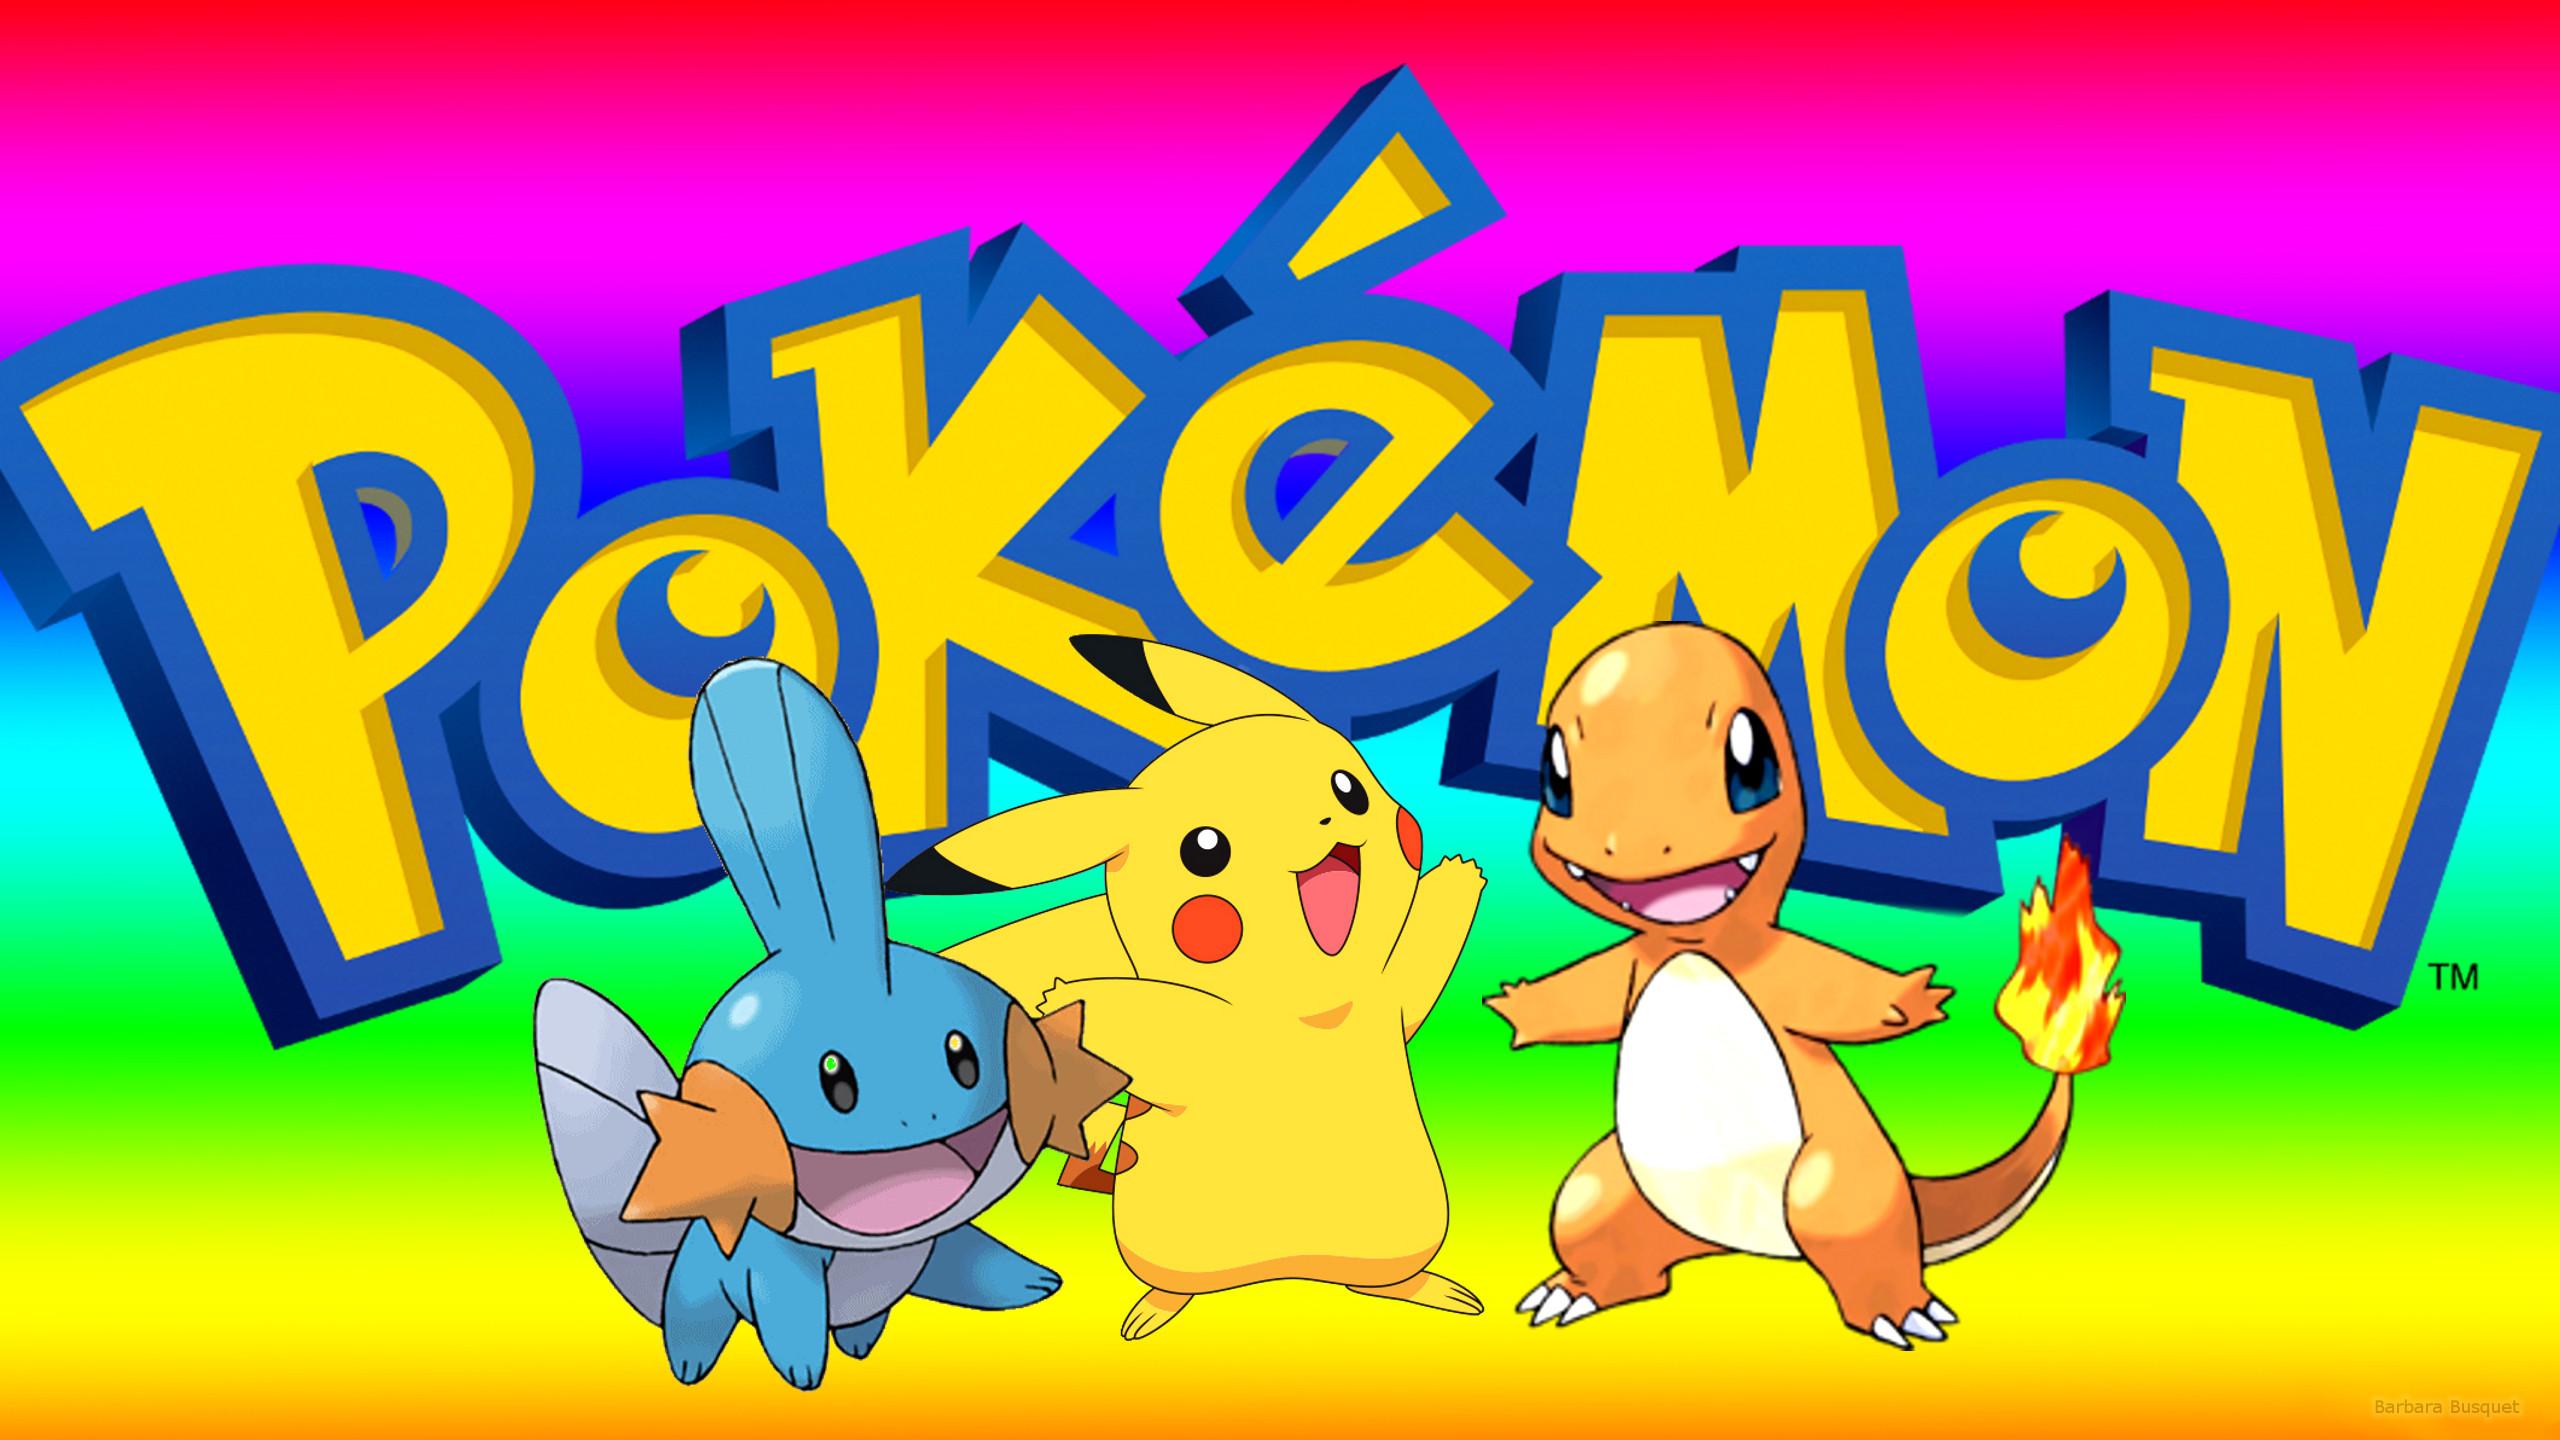 Pokemon Wallpaper With Pikachu Mudkip And Charmander